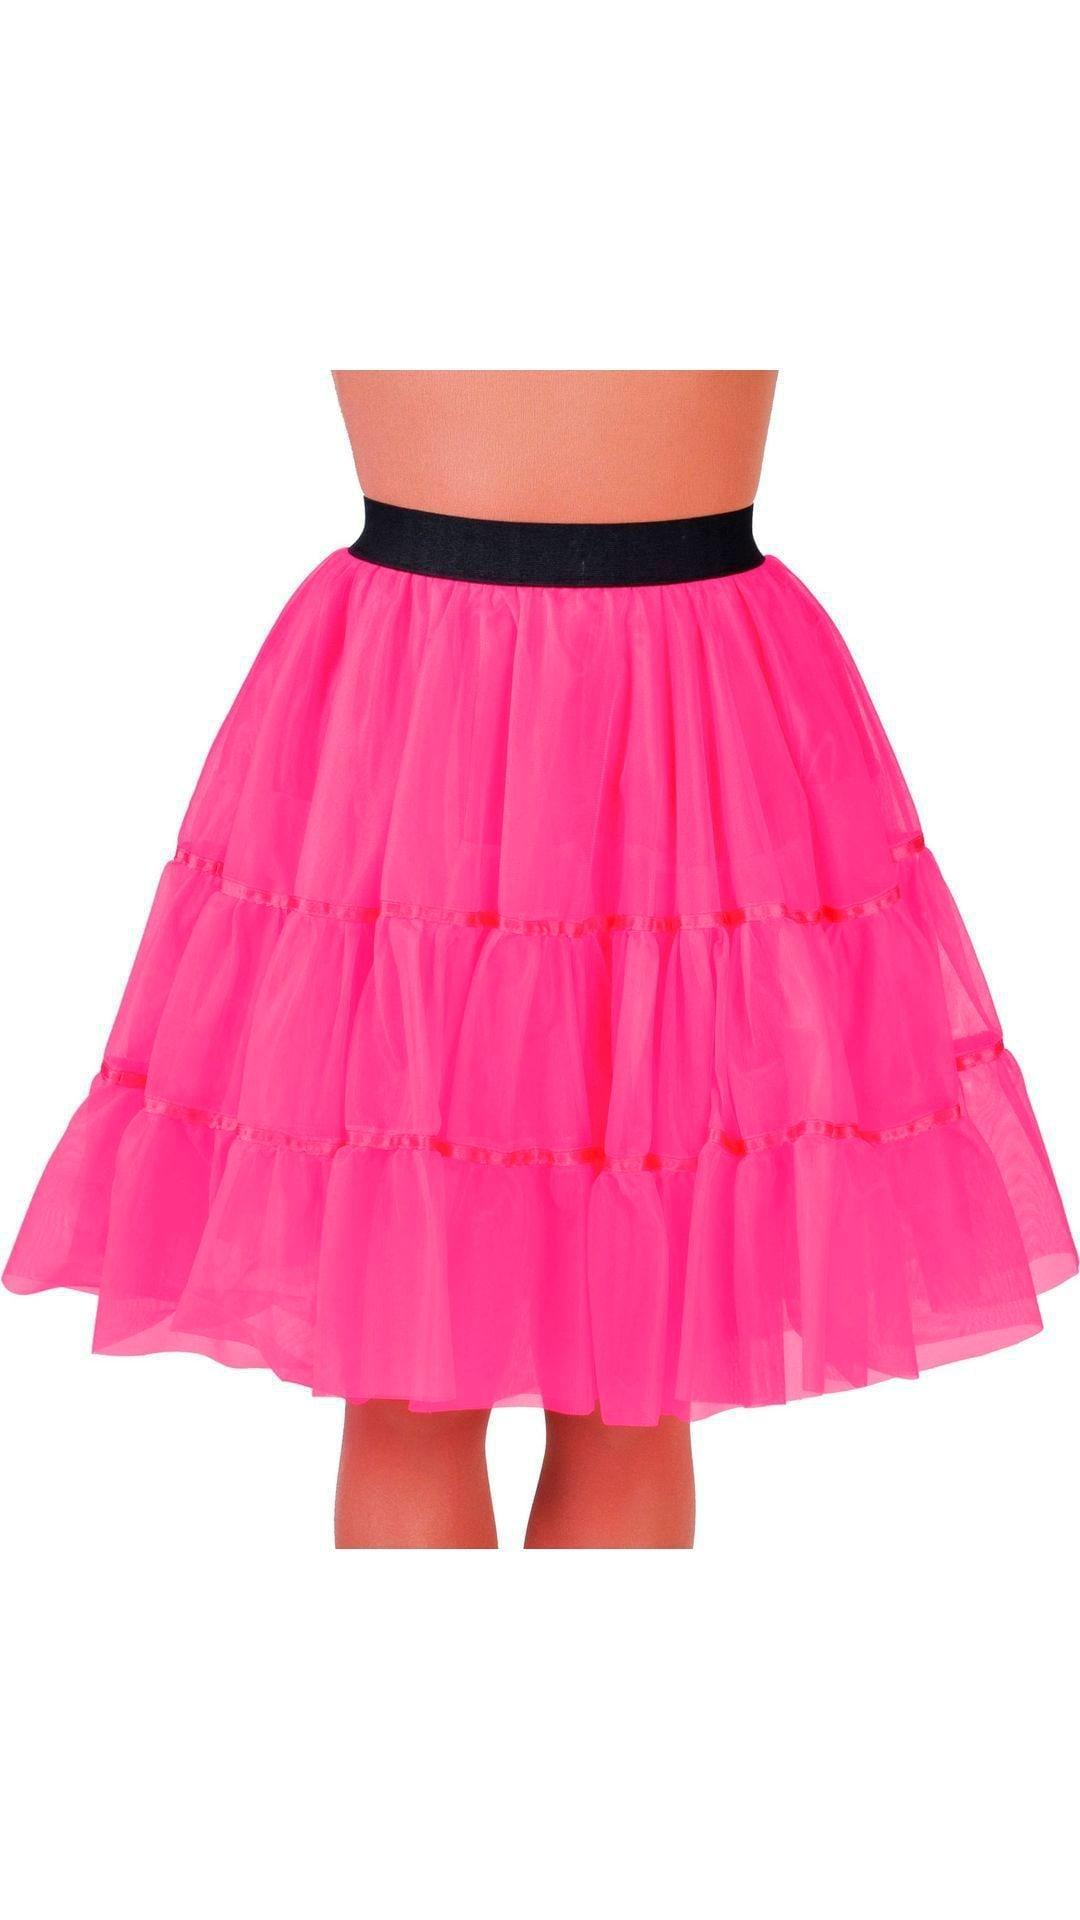 Roze petticoat middel lang dames